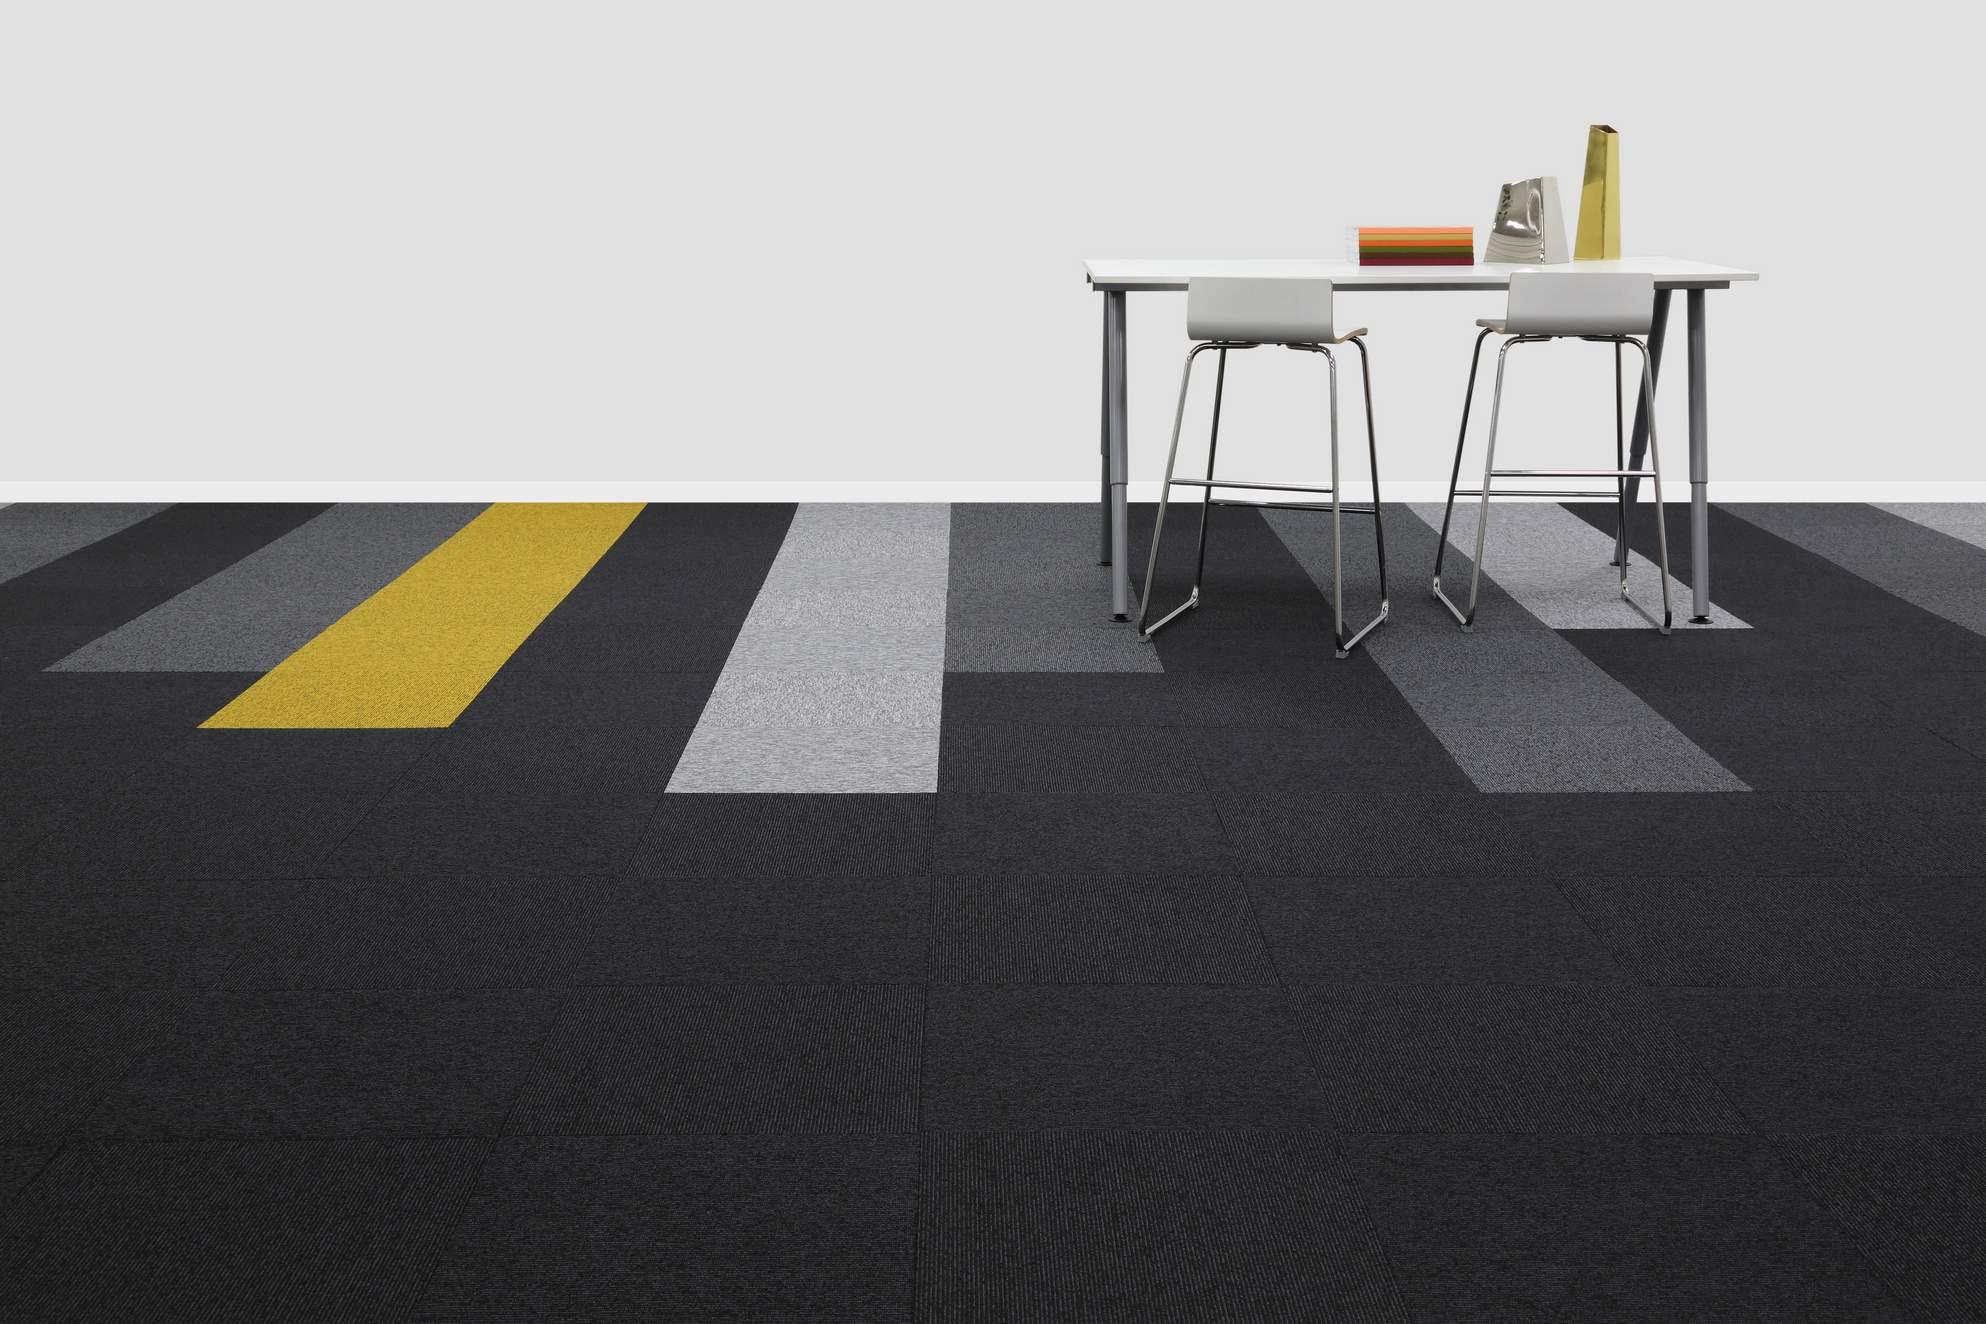 New balance stripe carpet tile range burmatex balance stripe carpet tiles dailygadgetfo Images